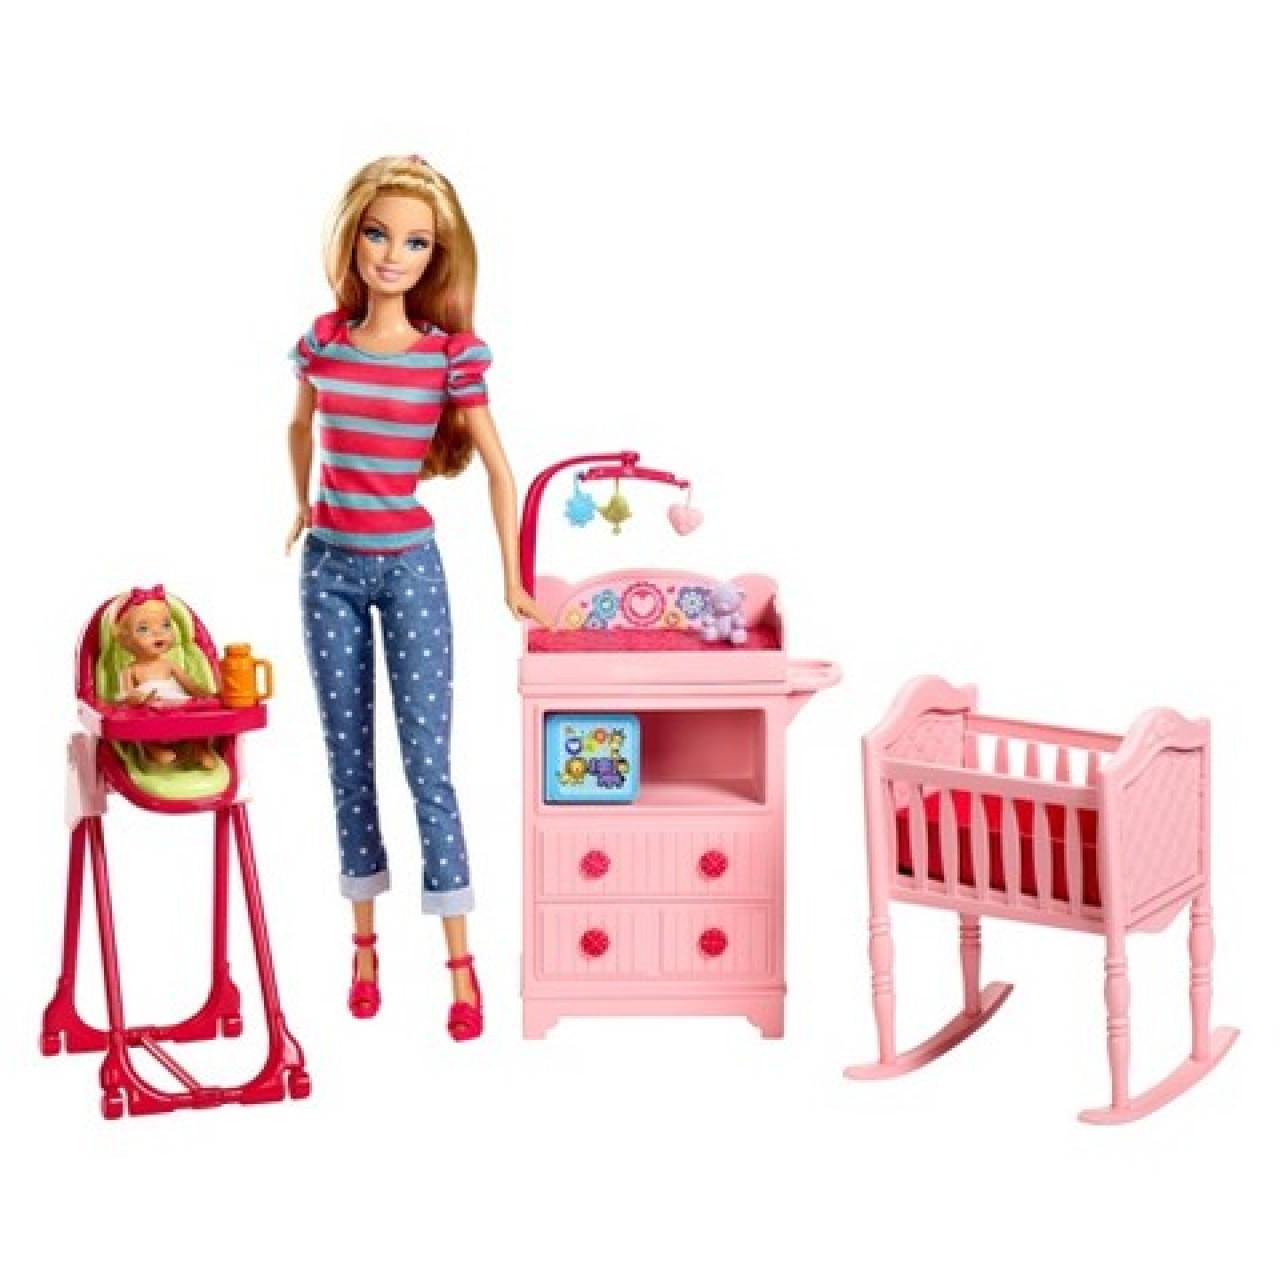 c2901a2f8 Набор кукла Барби с ребенком и аксессуарами